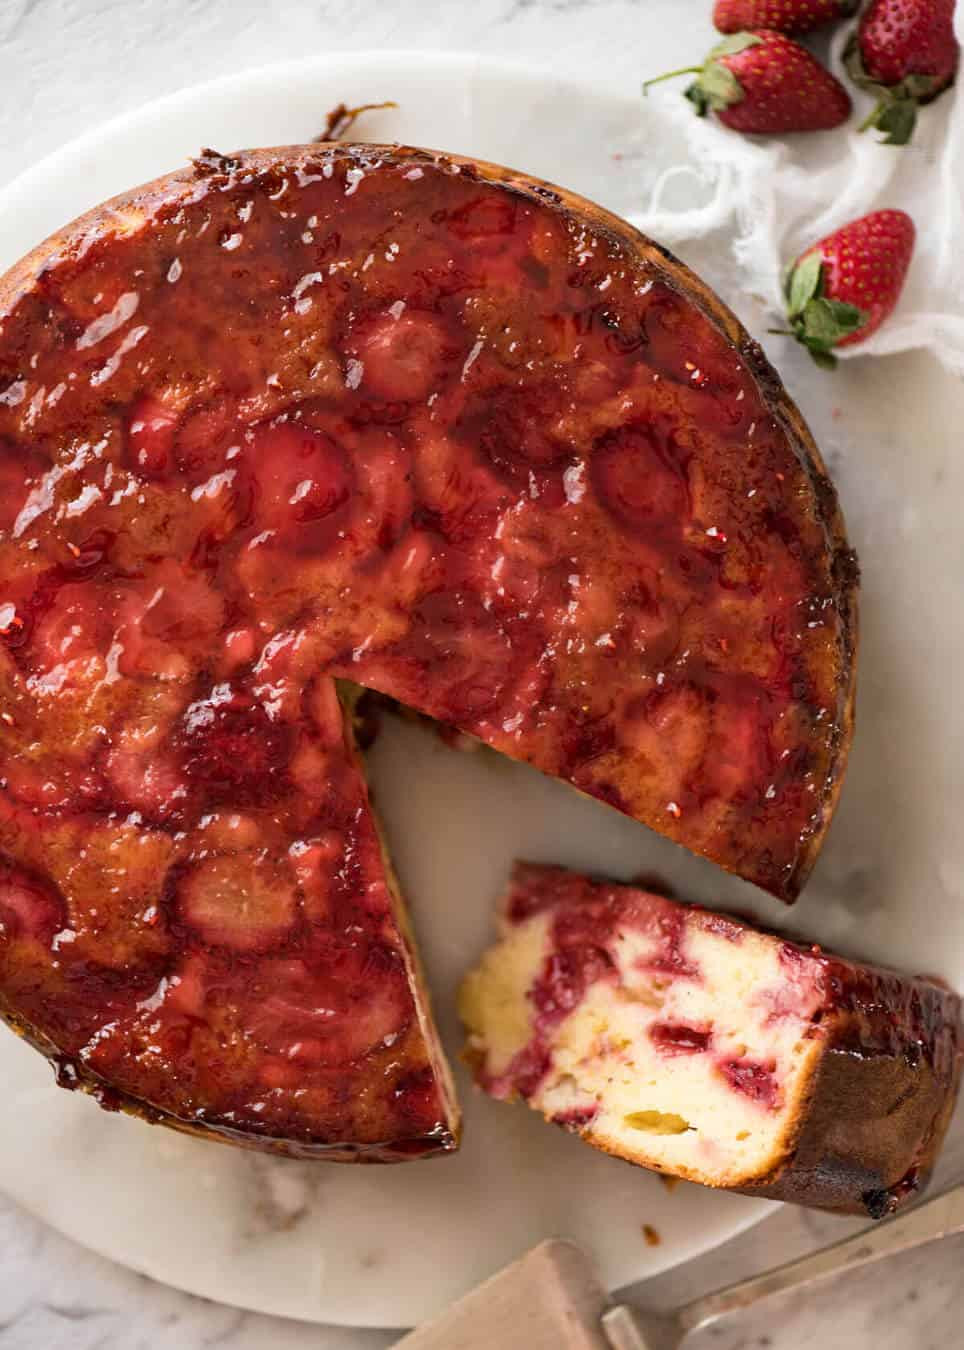 Strawberry Upside Down Cake  Upside Down Strawberry Cake